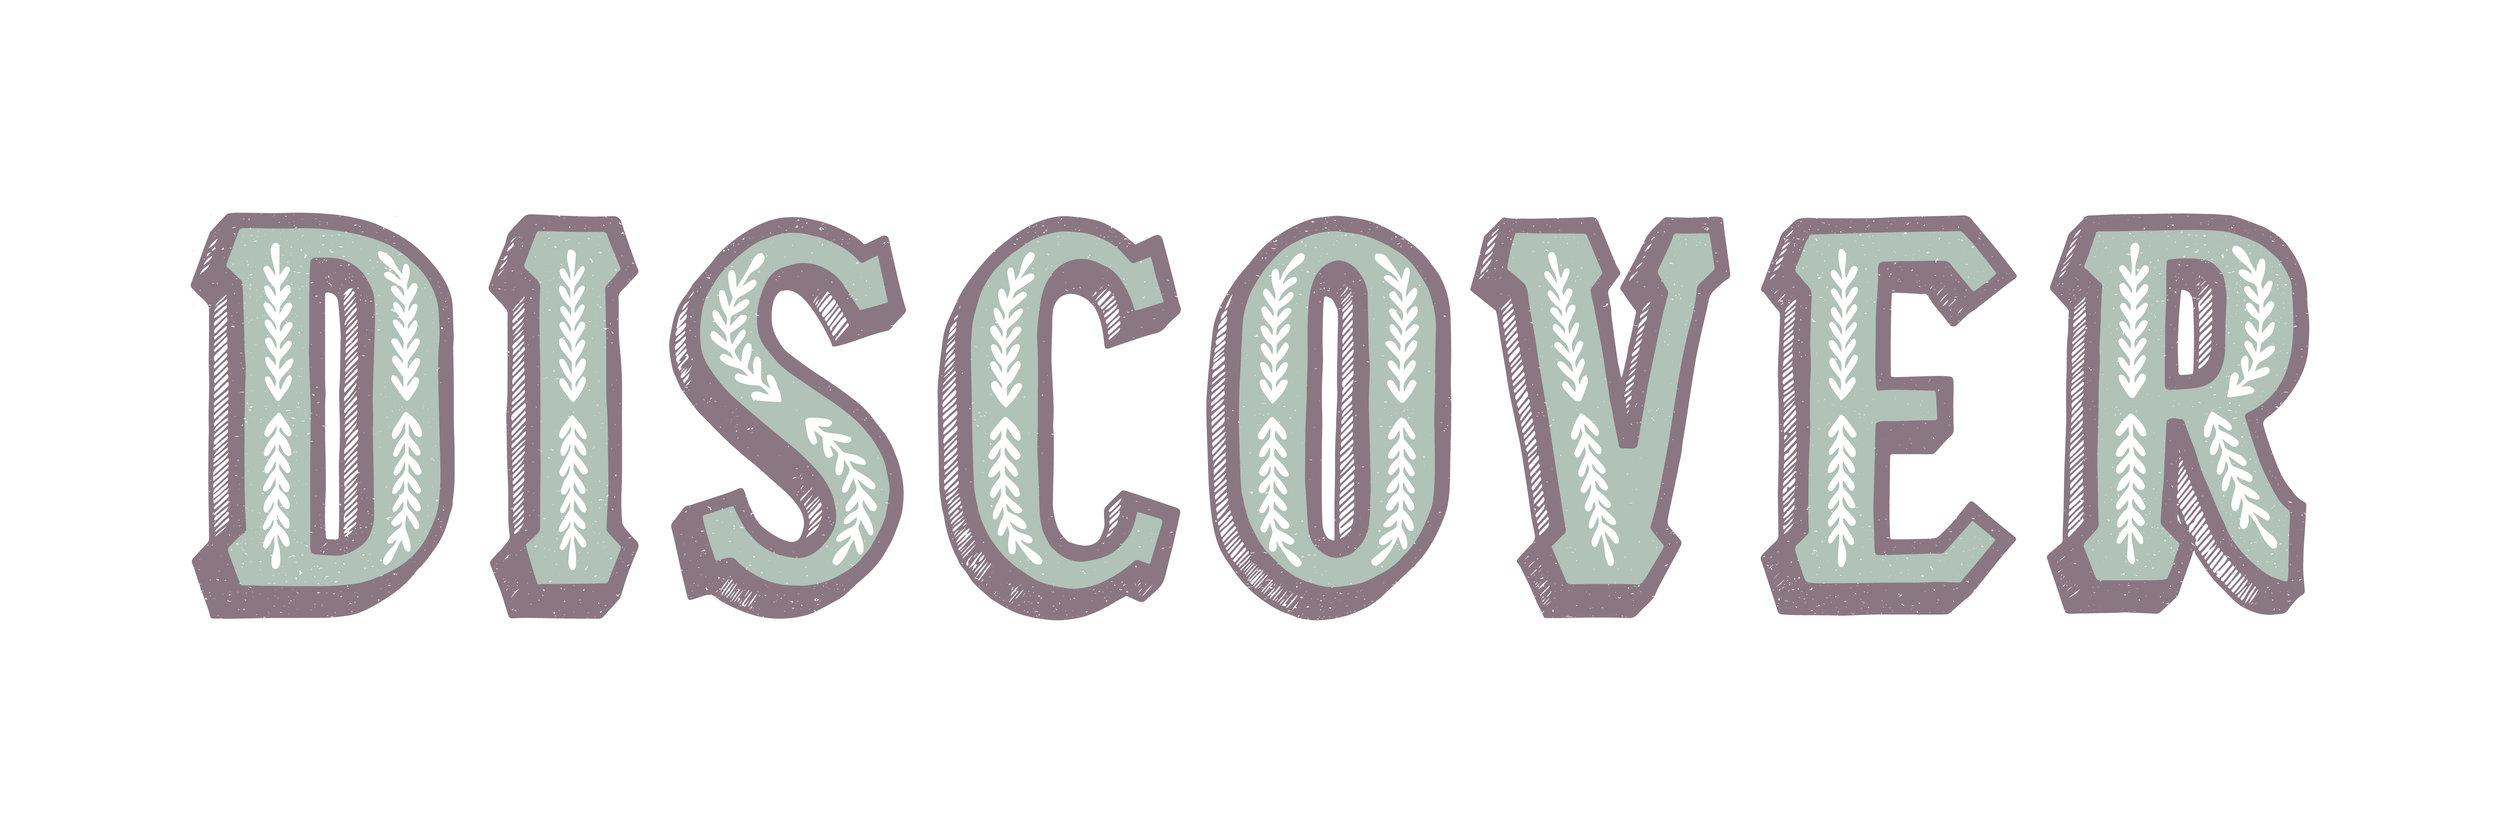 discover-01.jpg